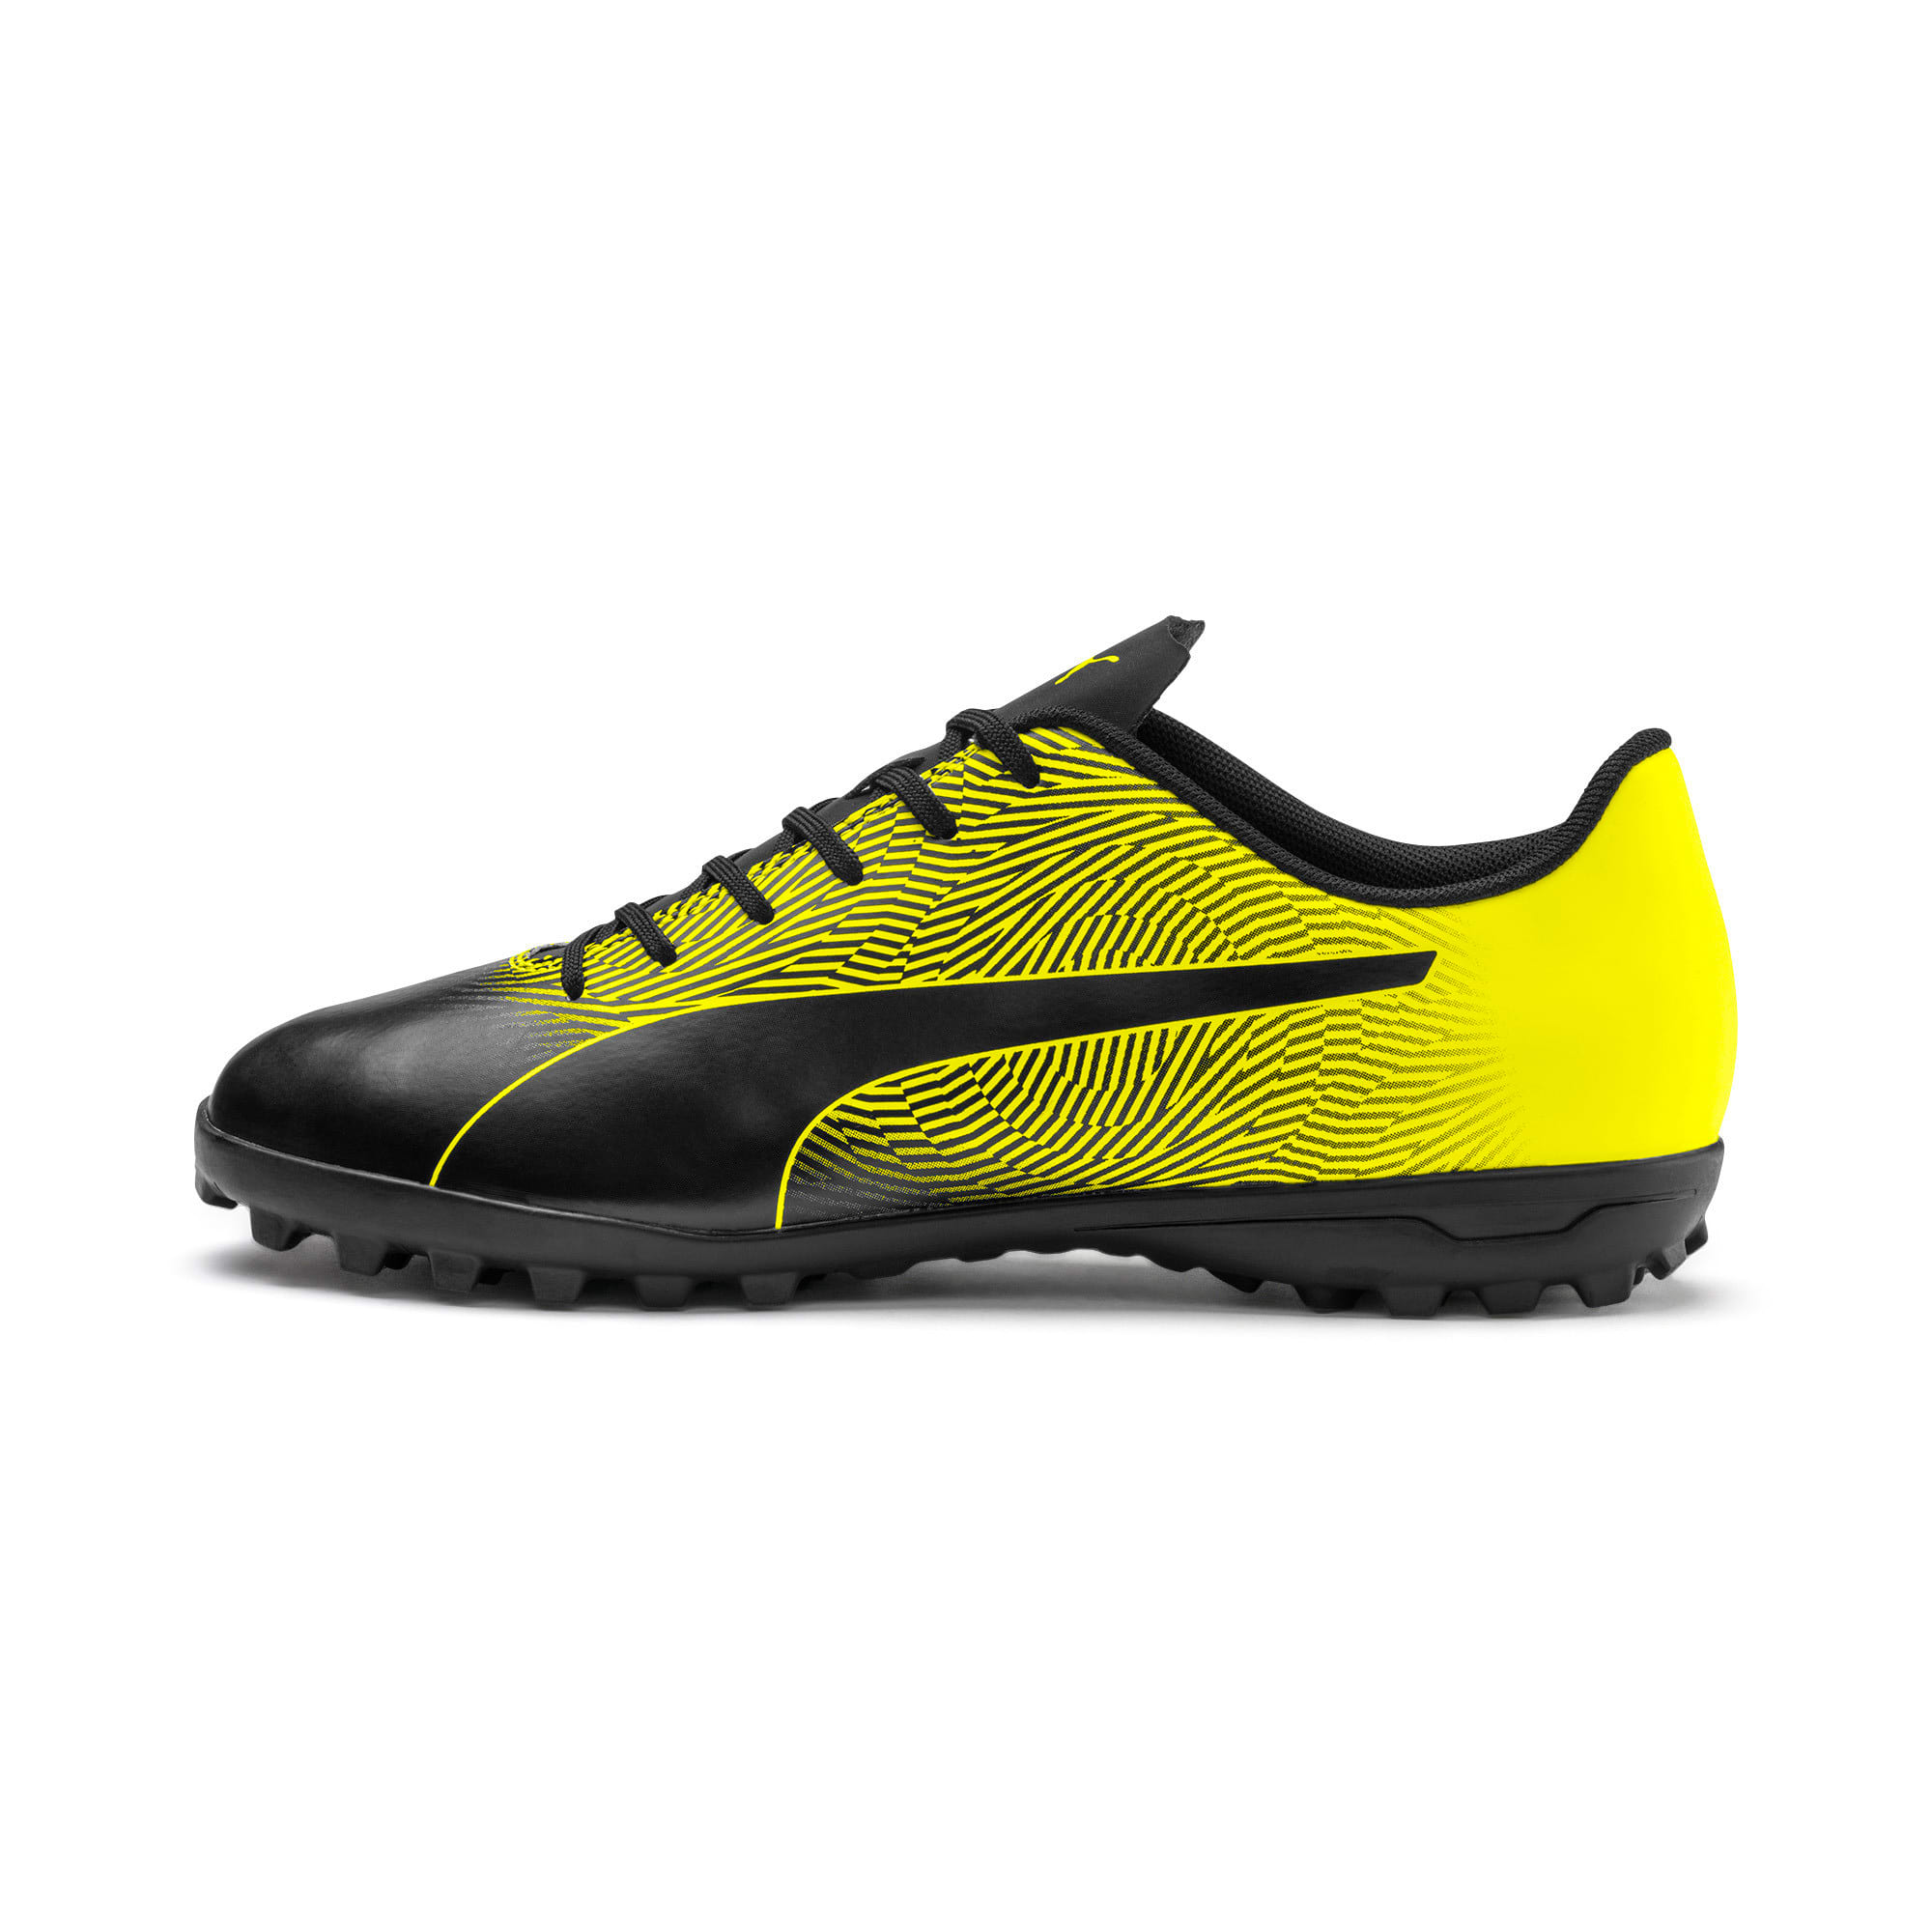 Thumbnail 1 of PUMA Spirit II TT Men's Soccer Shoes, Puma Black-Yellow Alert, medium